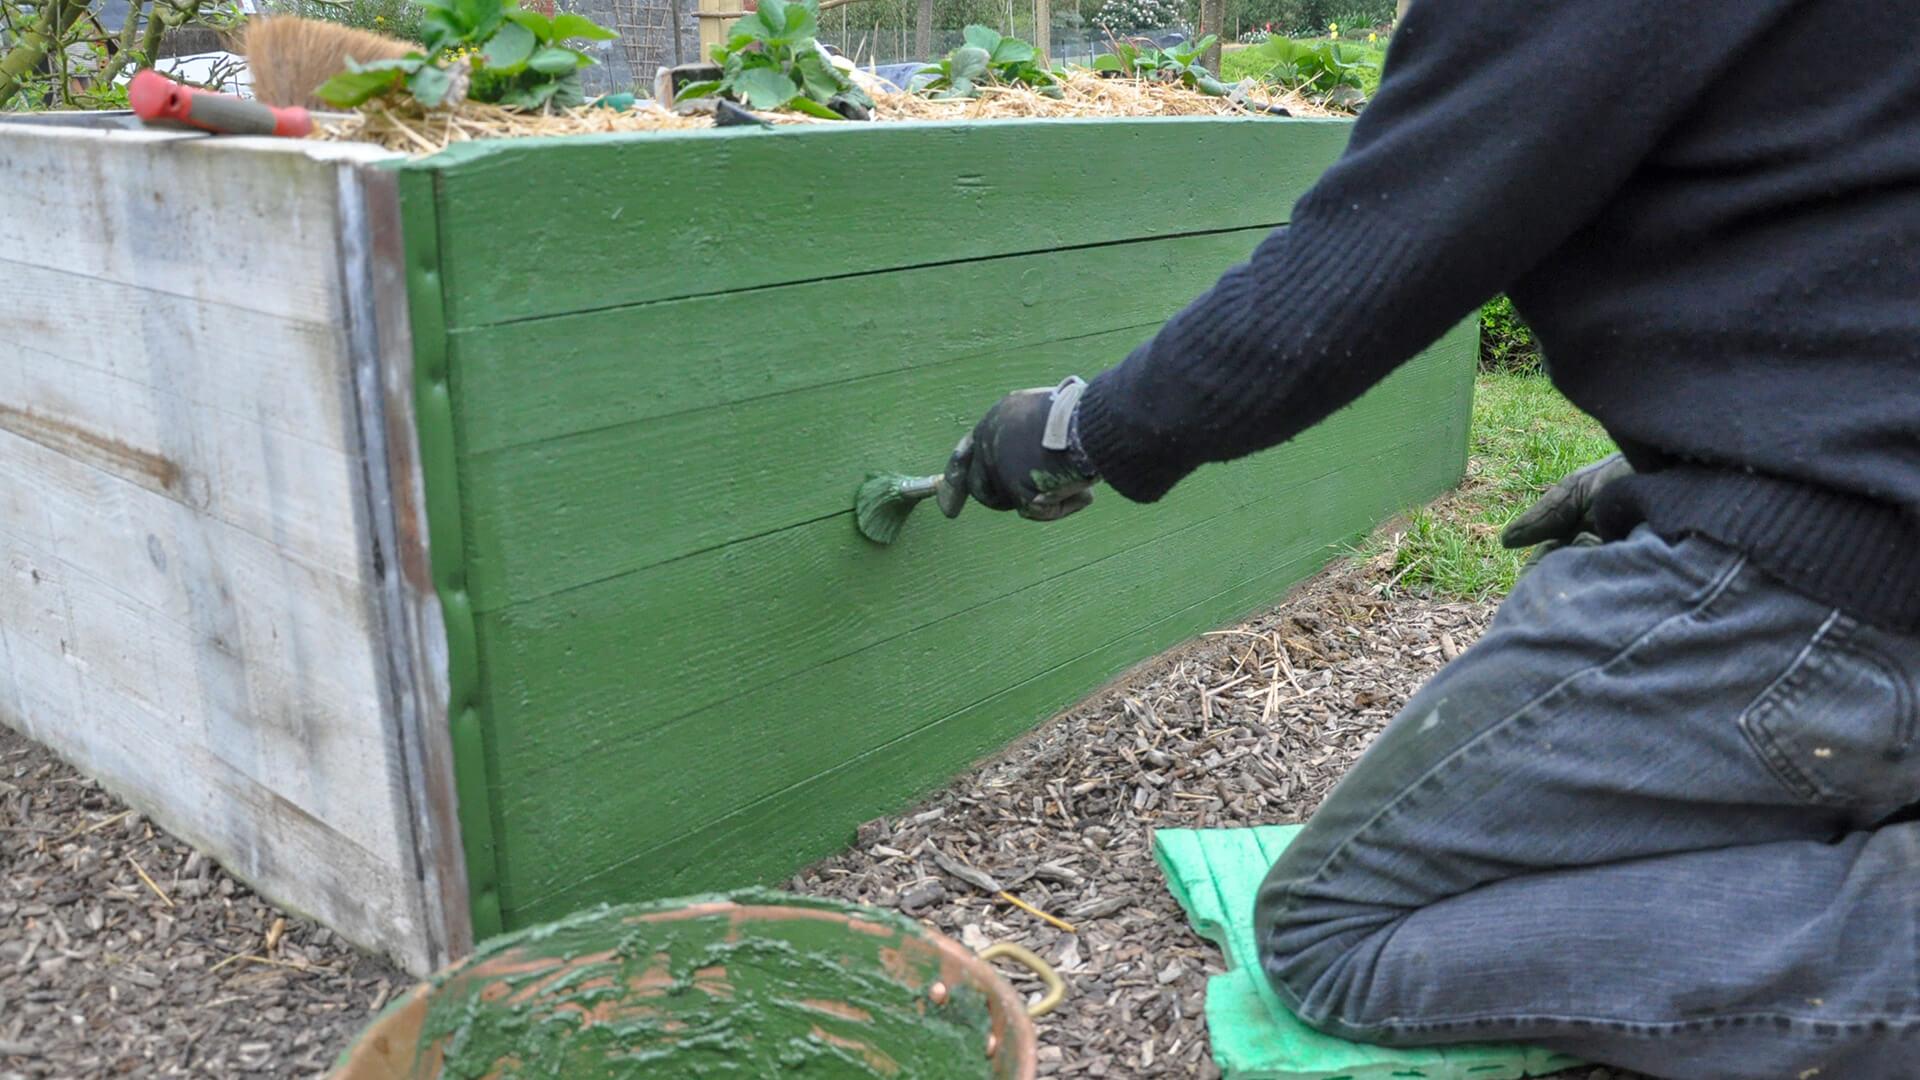 December Gardening Guide